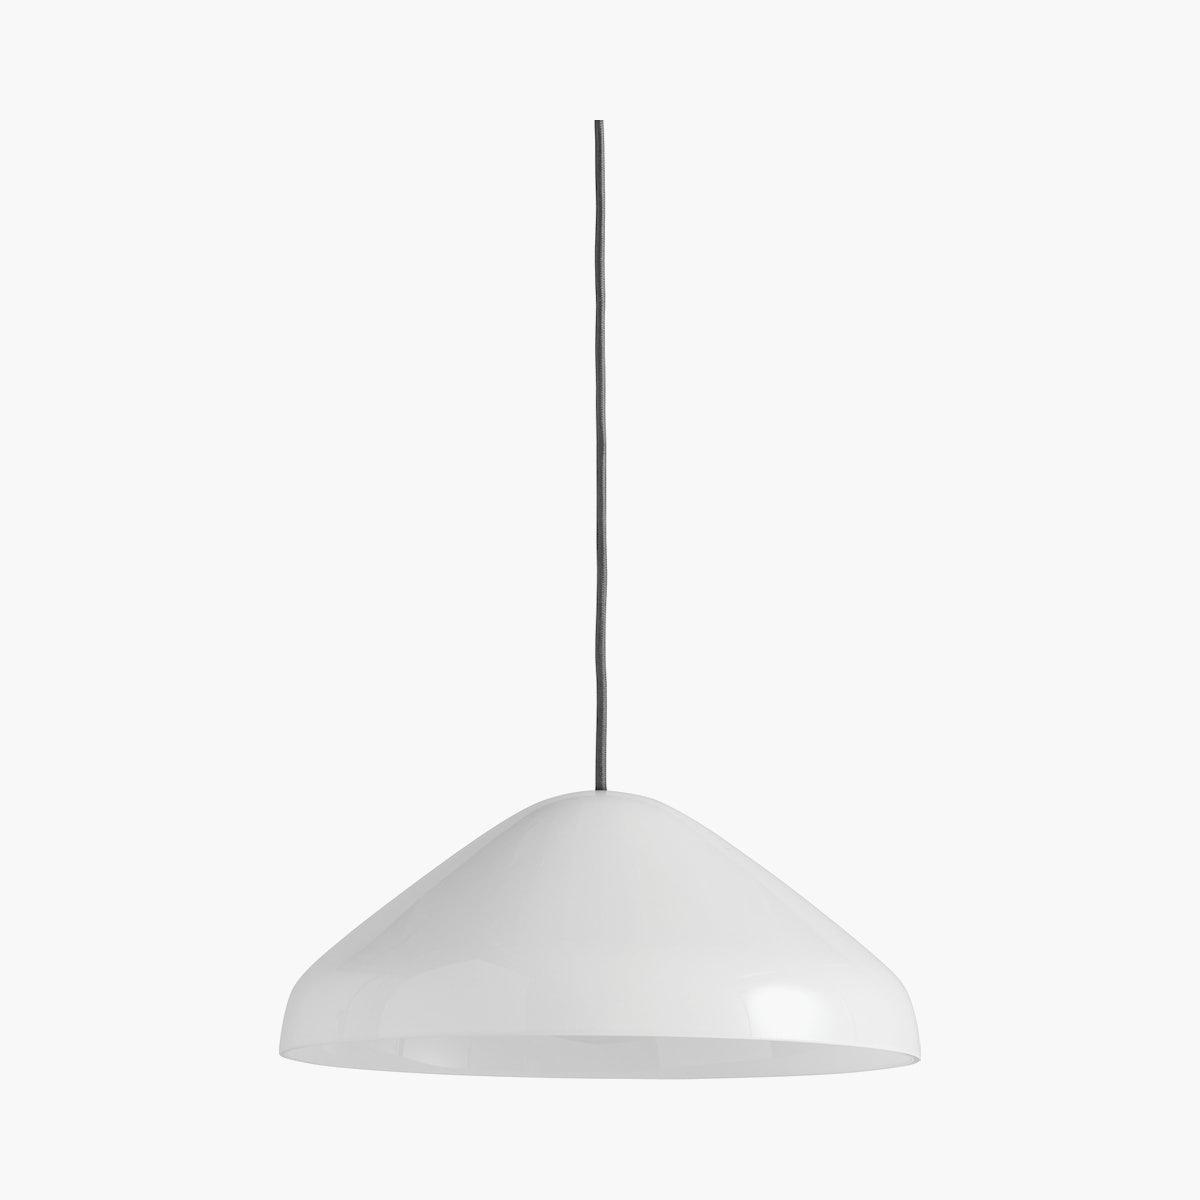 Pao Glass LED Pendant